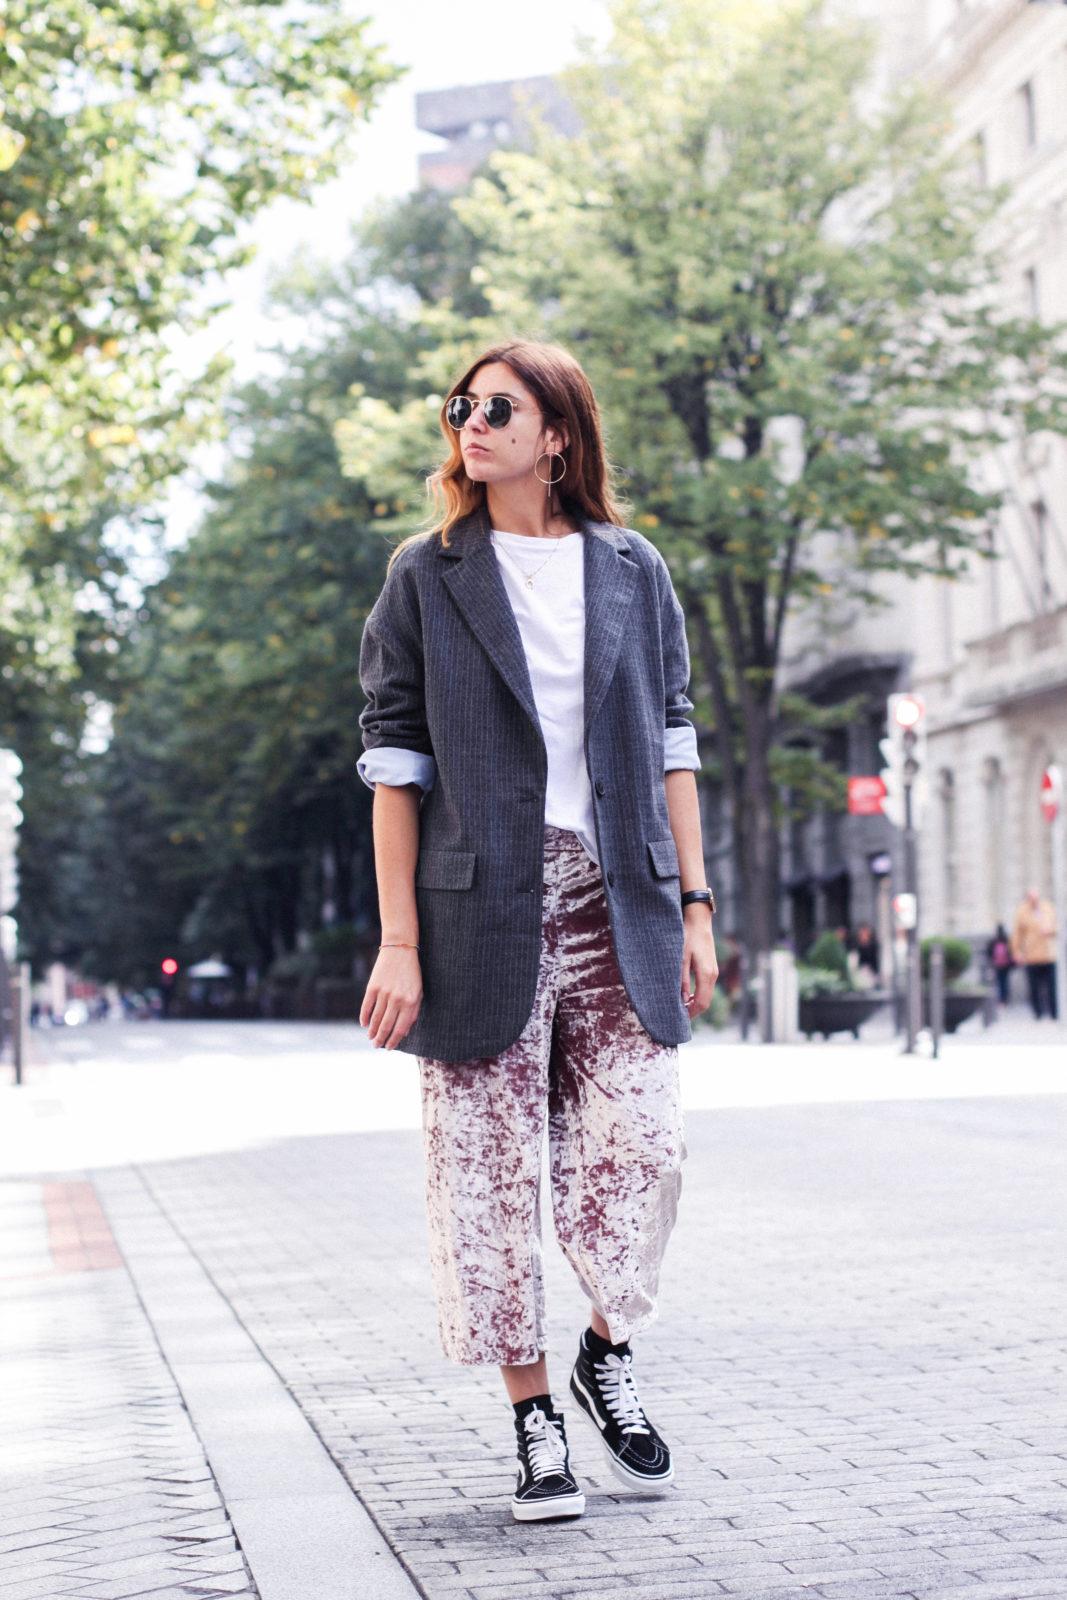 pantalones_terciopelo_rosa_pull_and_bear_blazer_vans_pendientes_aros_gucci-31